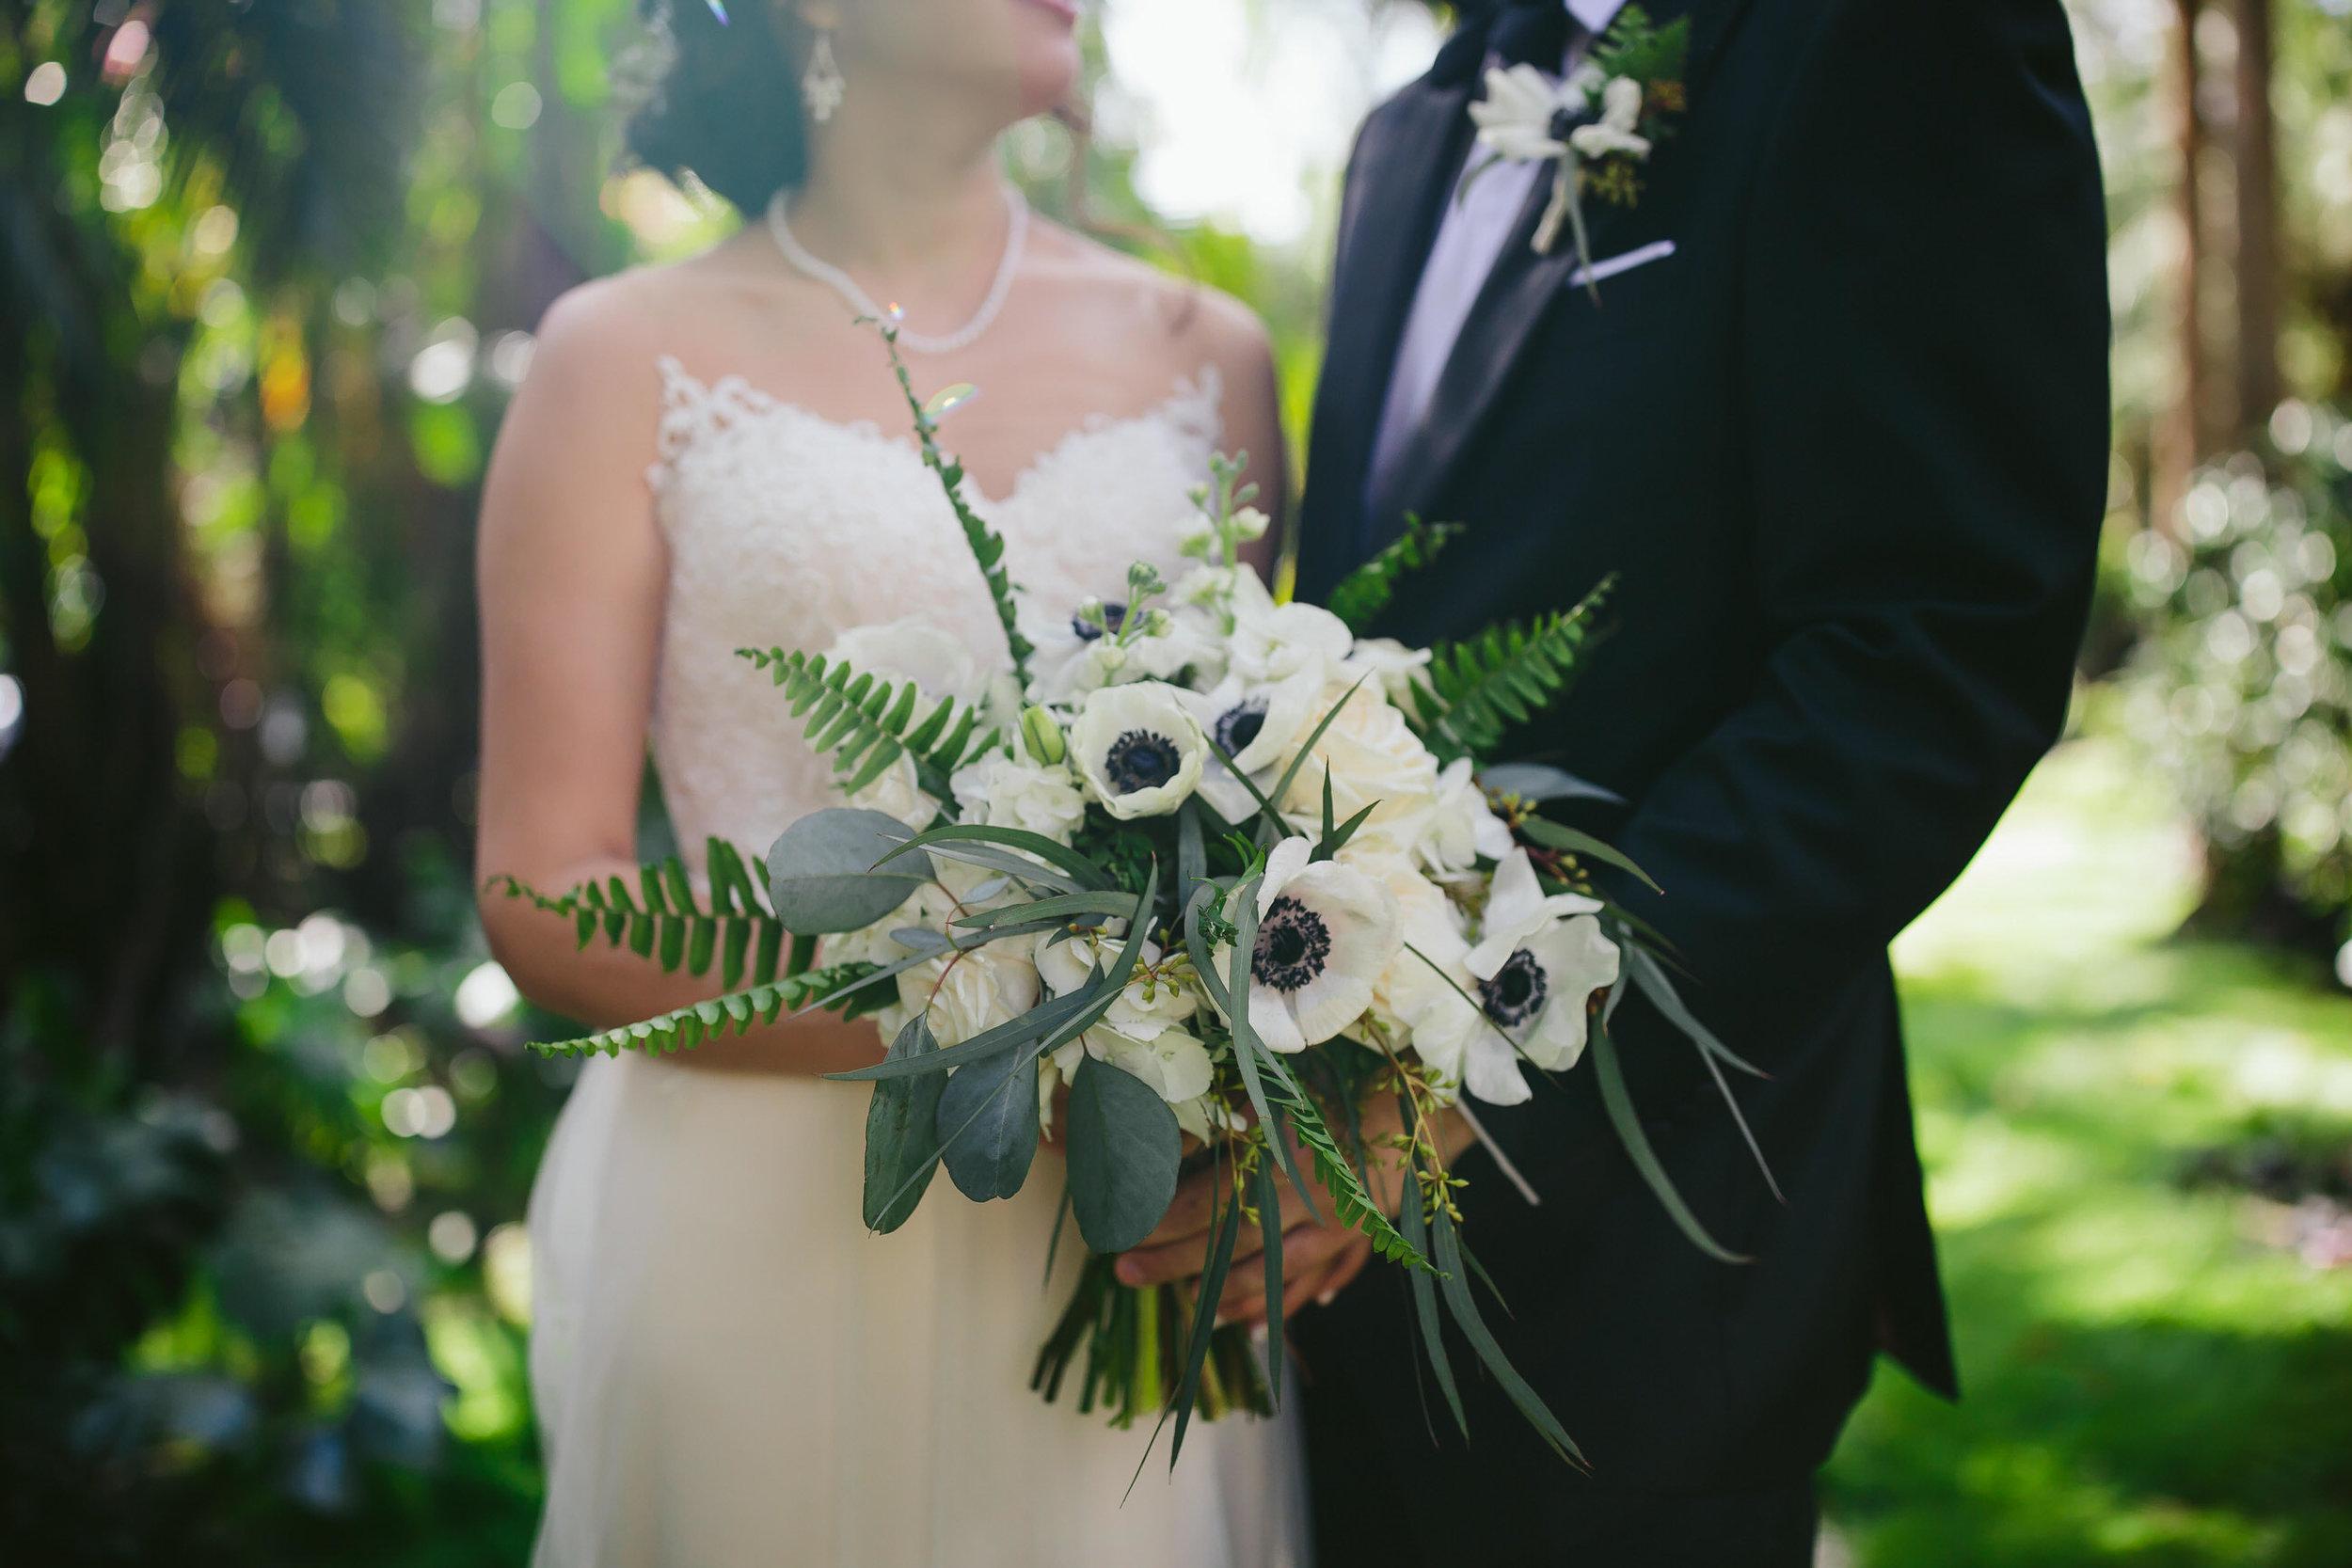 gorgeous_wedding_bouquet_tiny_house_photo_international_award_winning_fearless_photographer.jpg